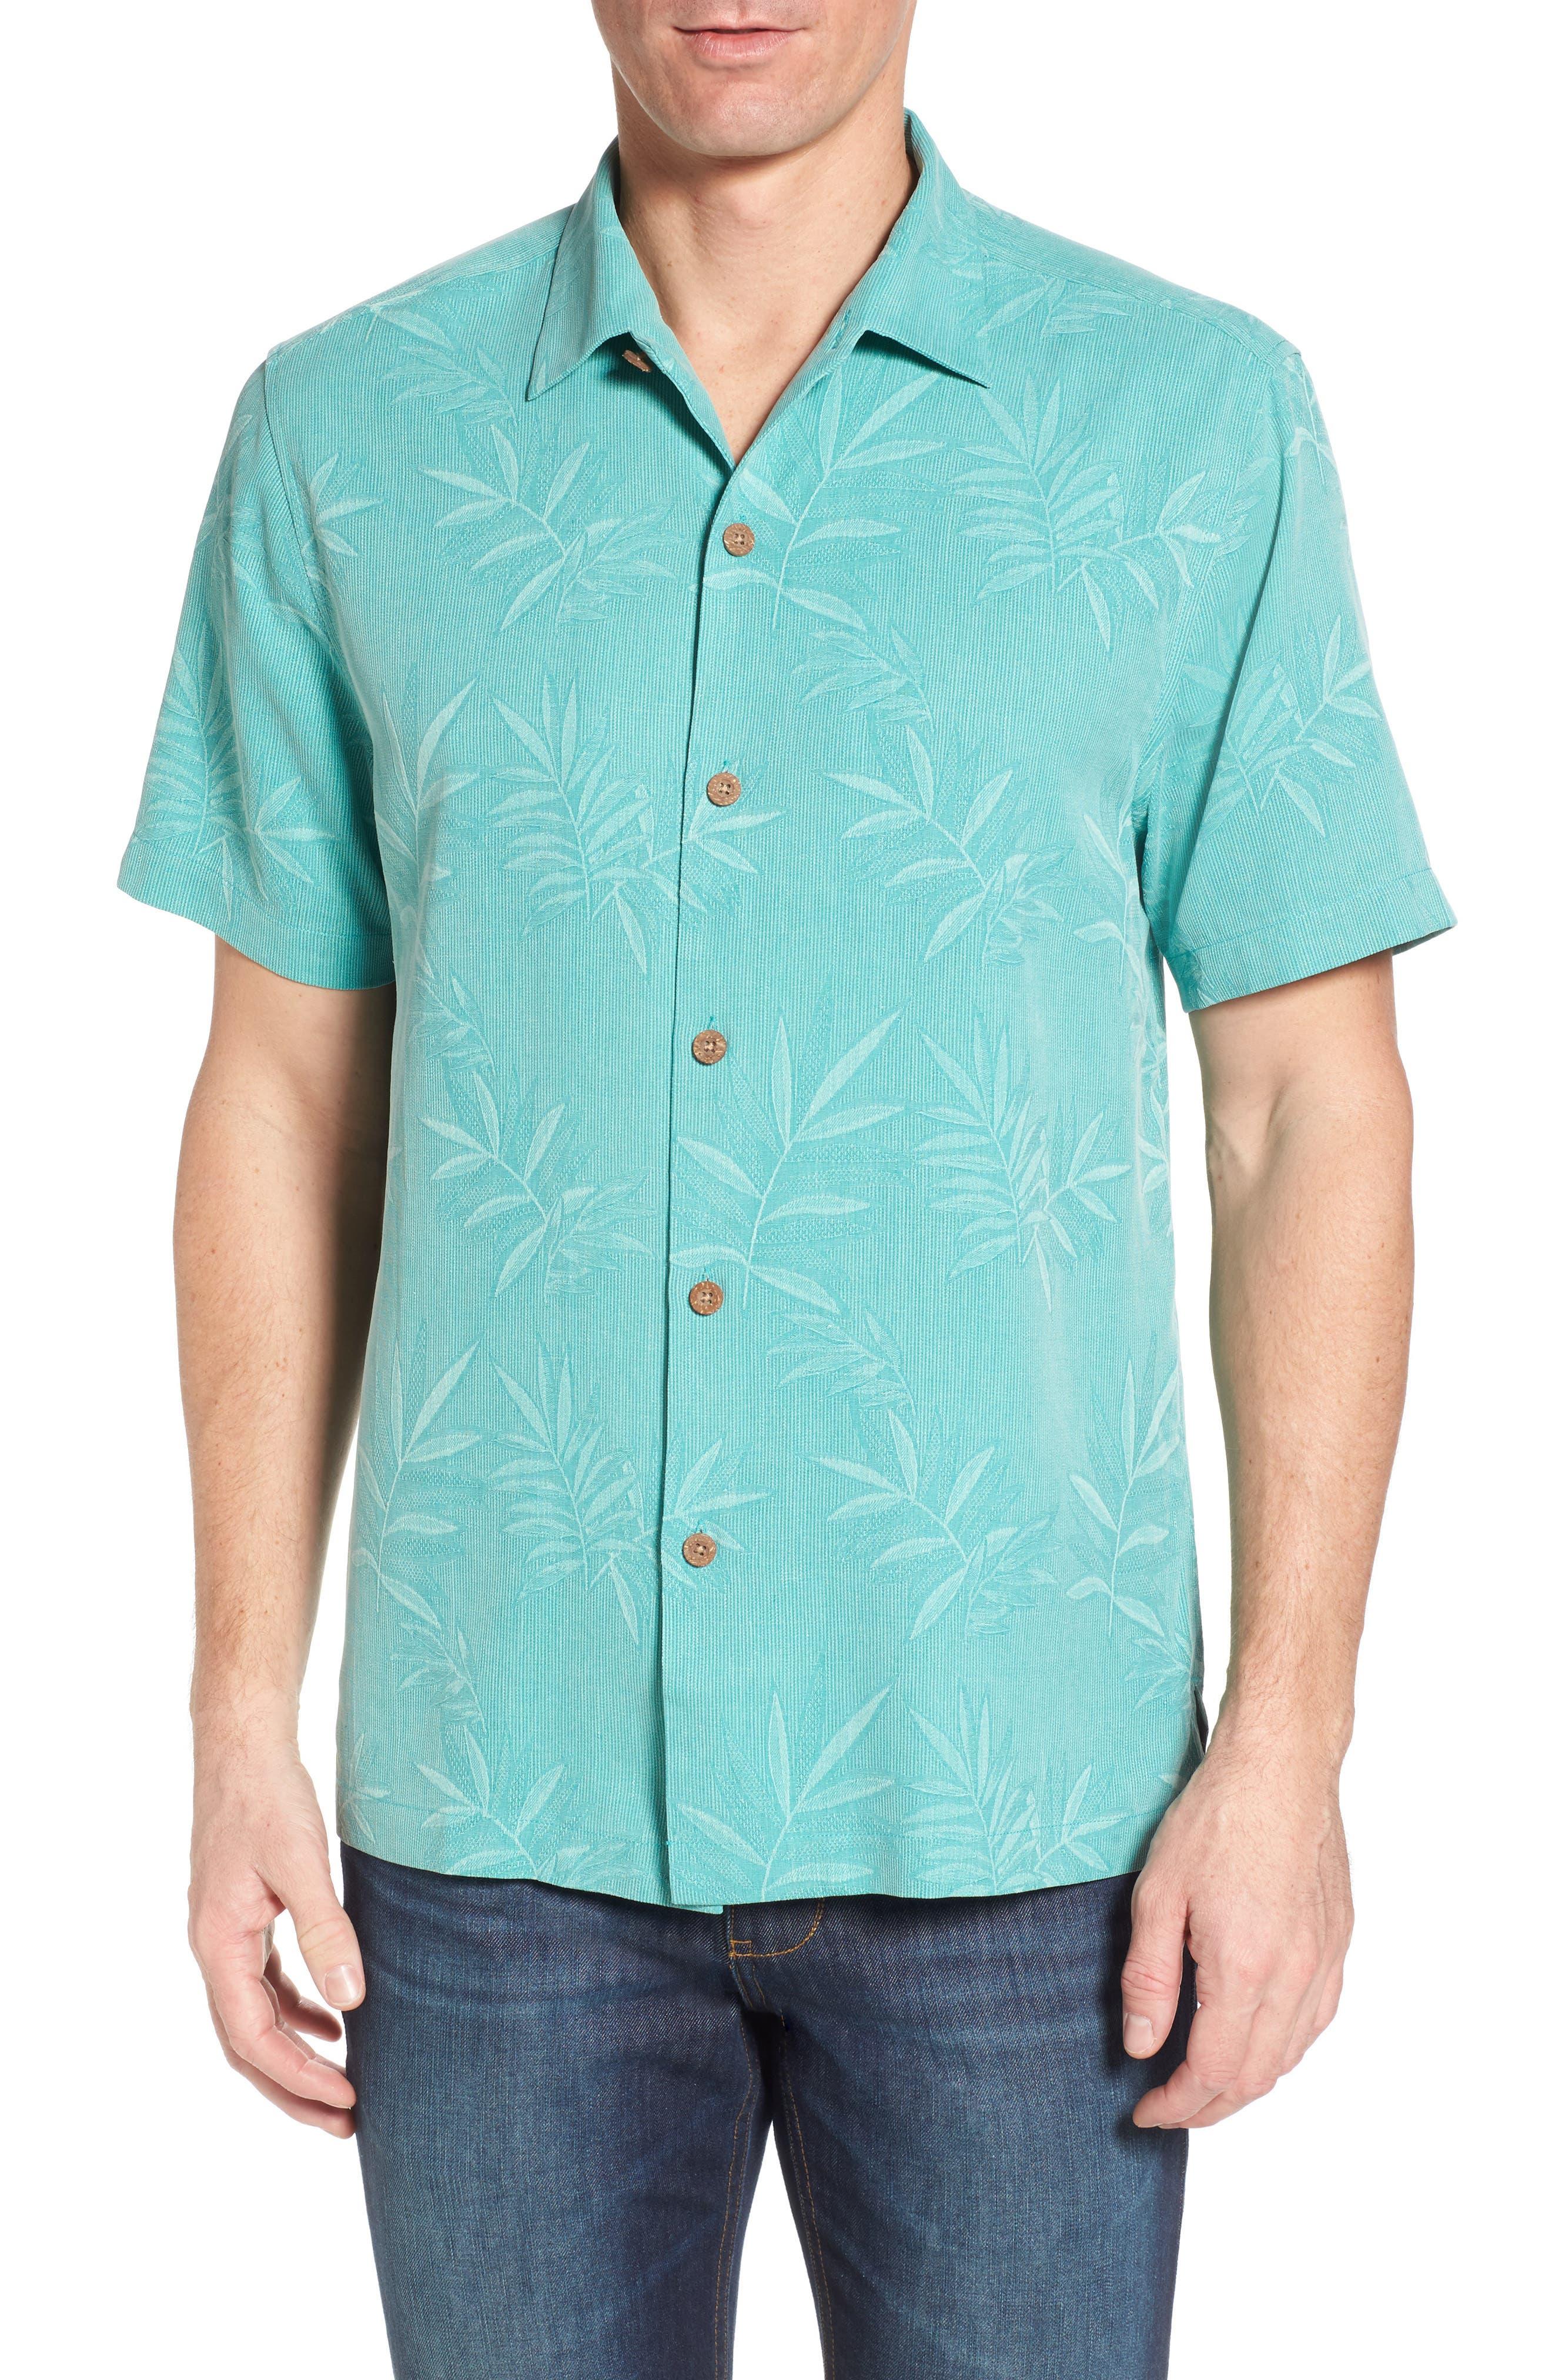 Main Image - Tommy Bahama Luau Floral Silk Shirt